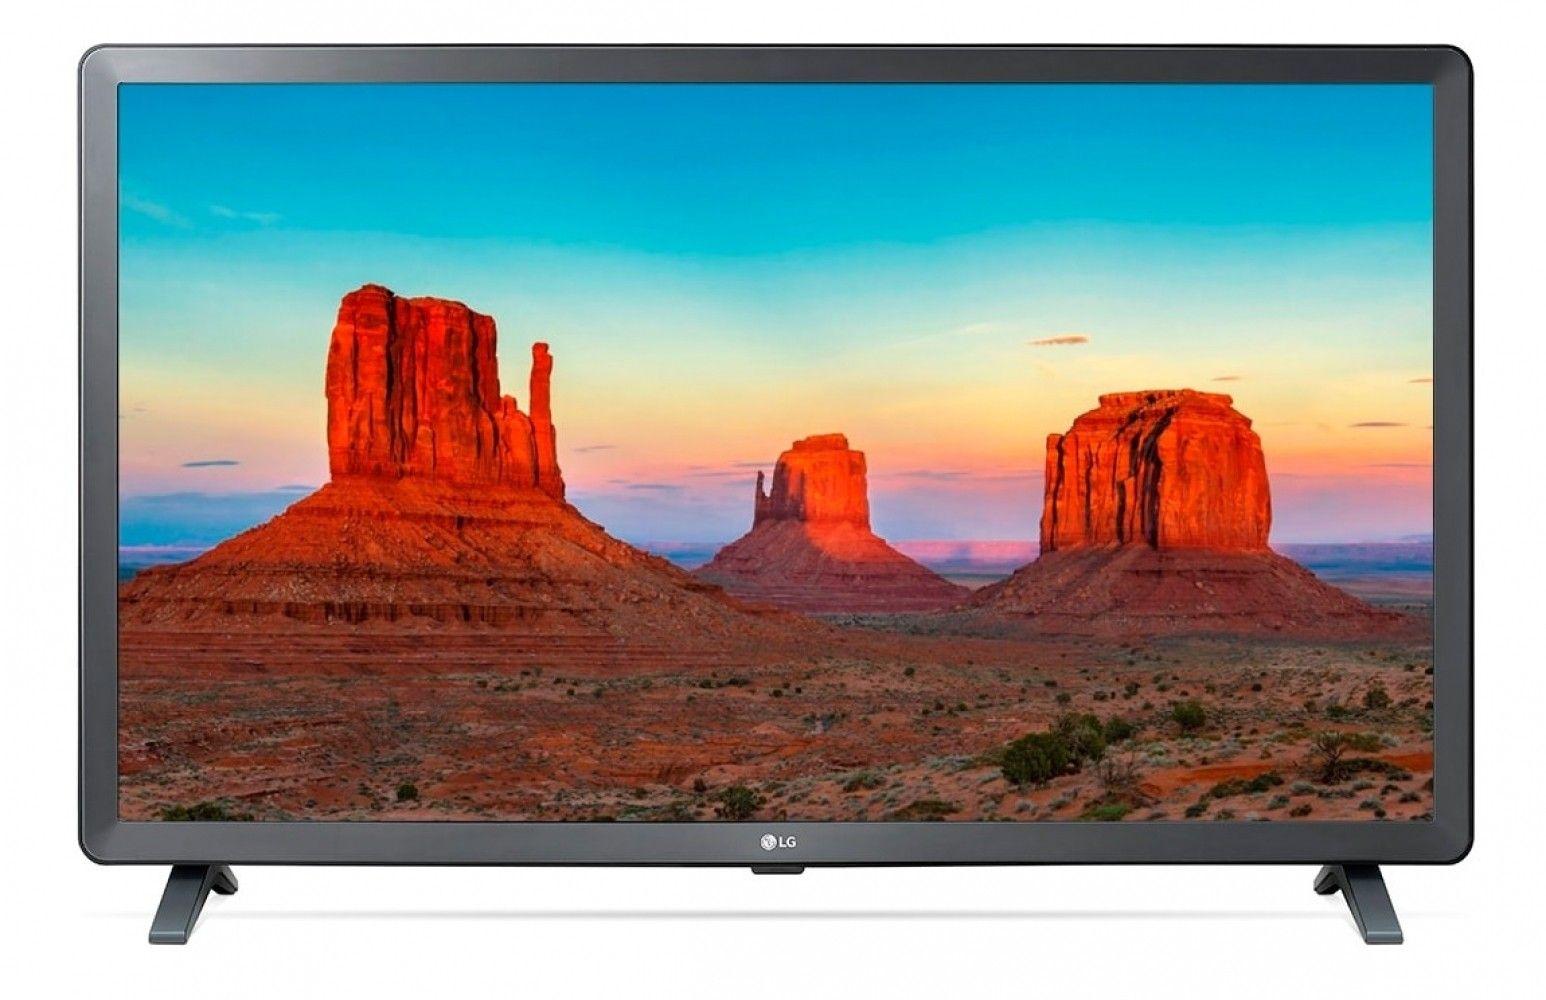 Купить Телевизор LG 32LK615BPLB